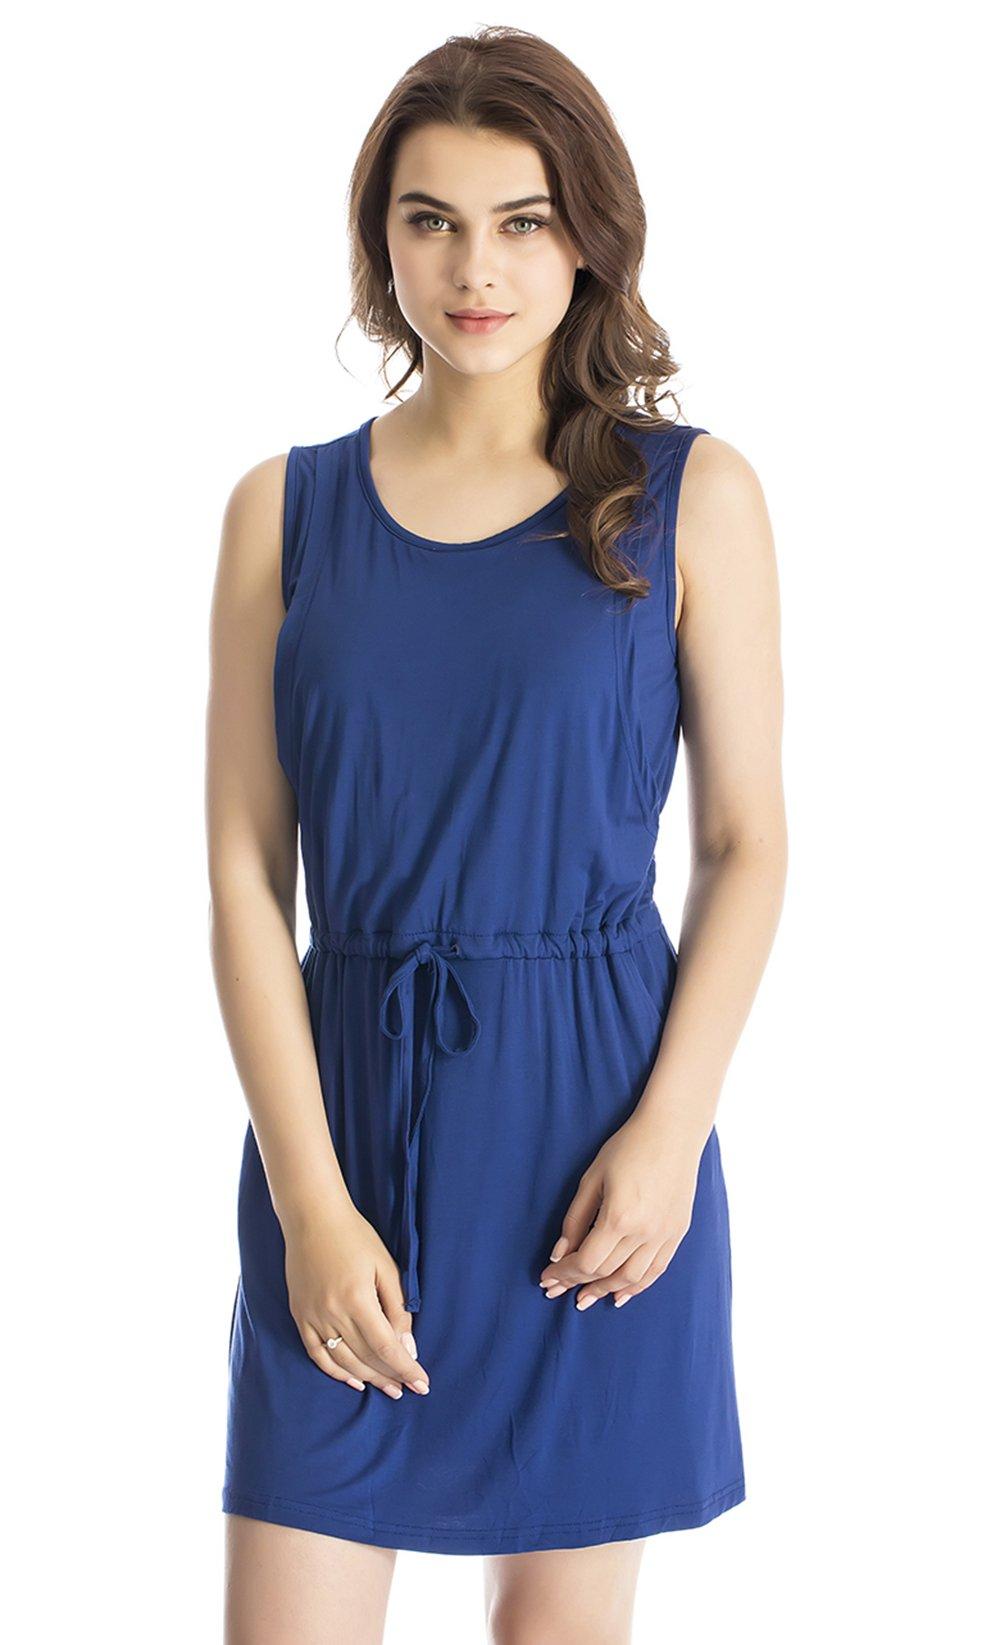 Modern Mummy Women's Pure Sleeveless Maternity Nursing Dress for Breastfeeding Blue Medium